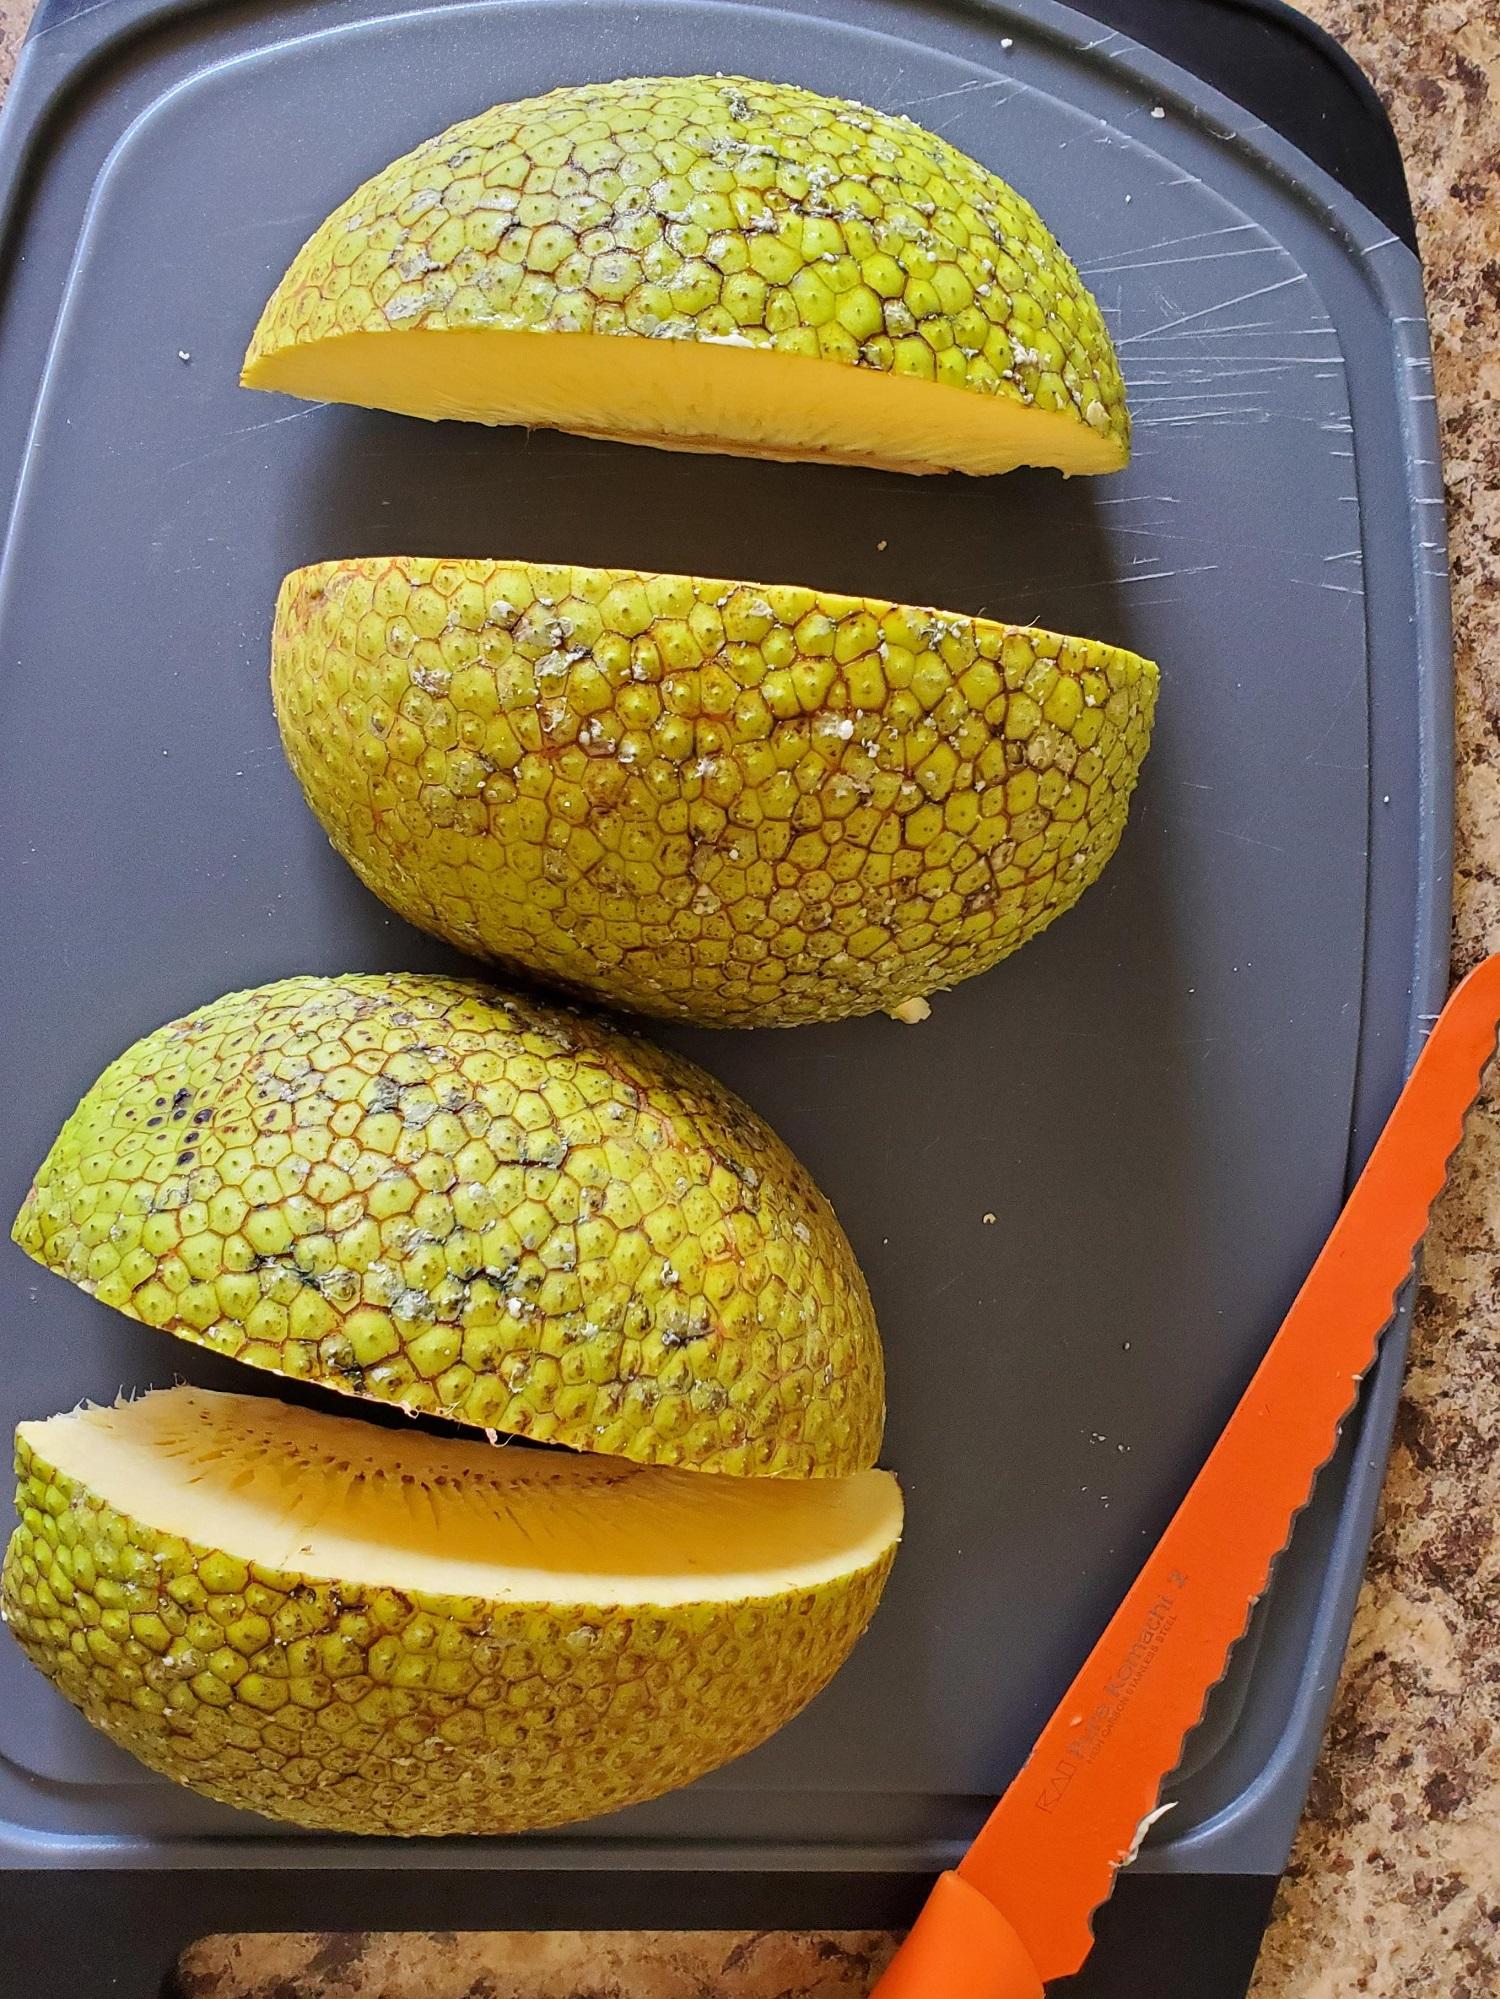 photo of a quartered ulu fruit